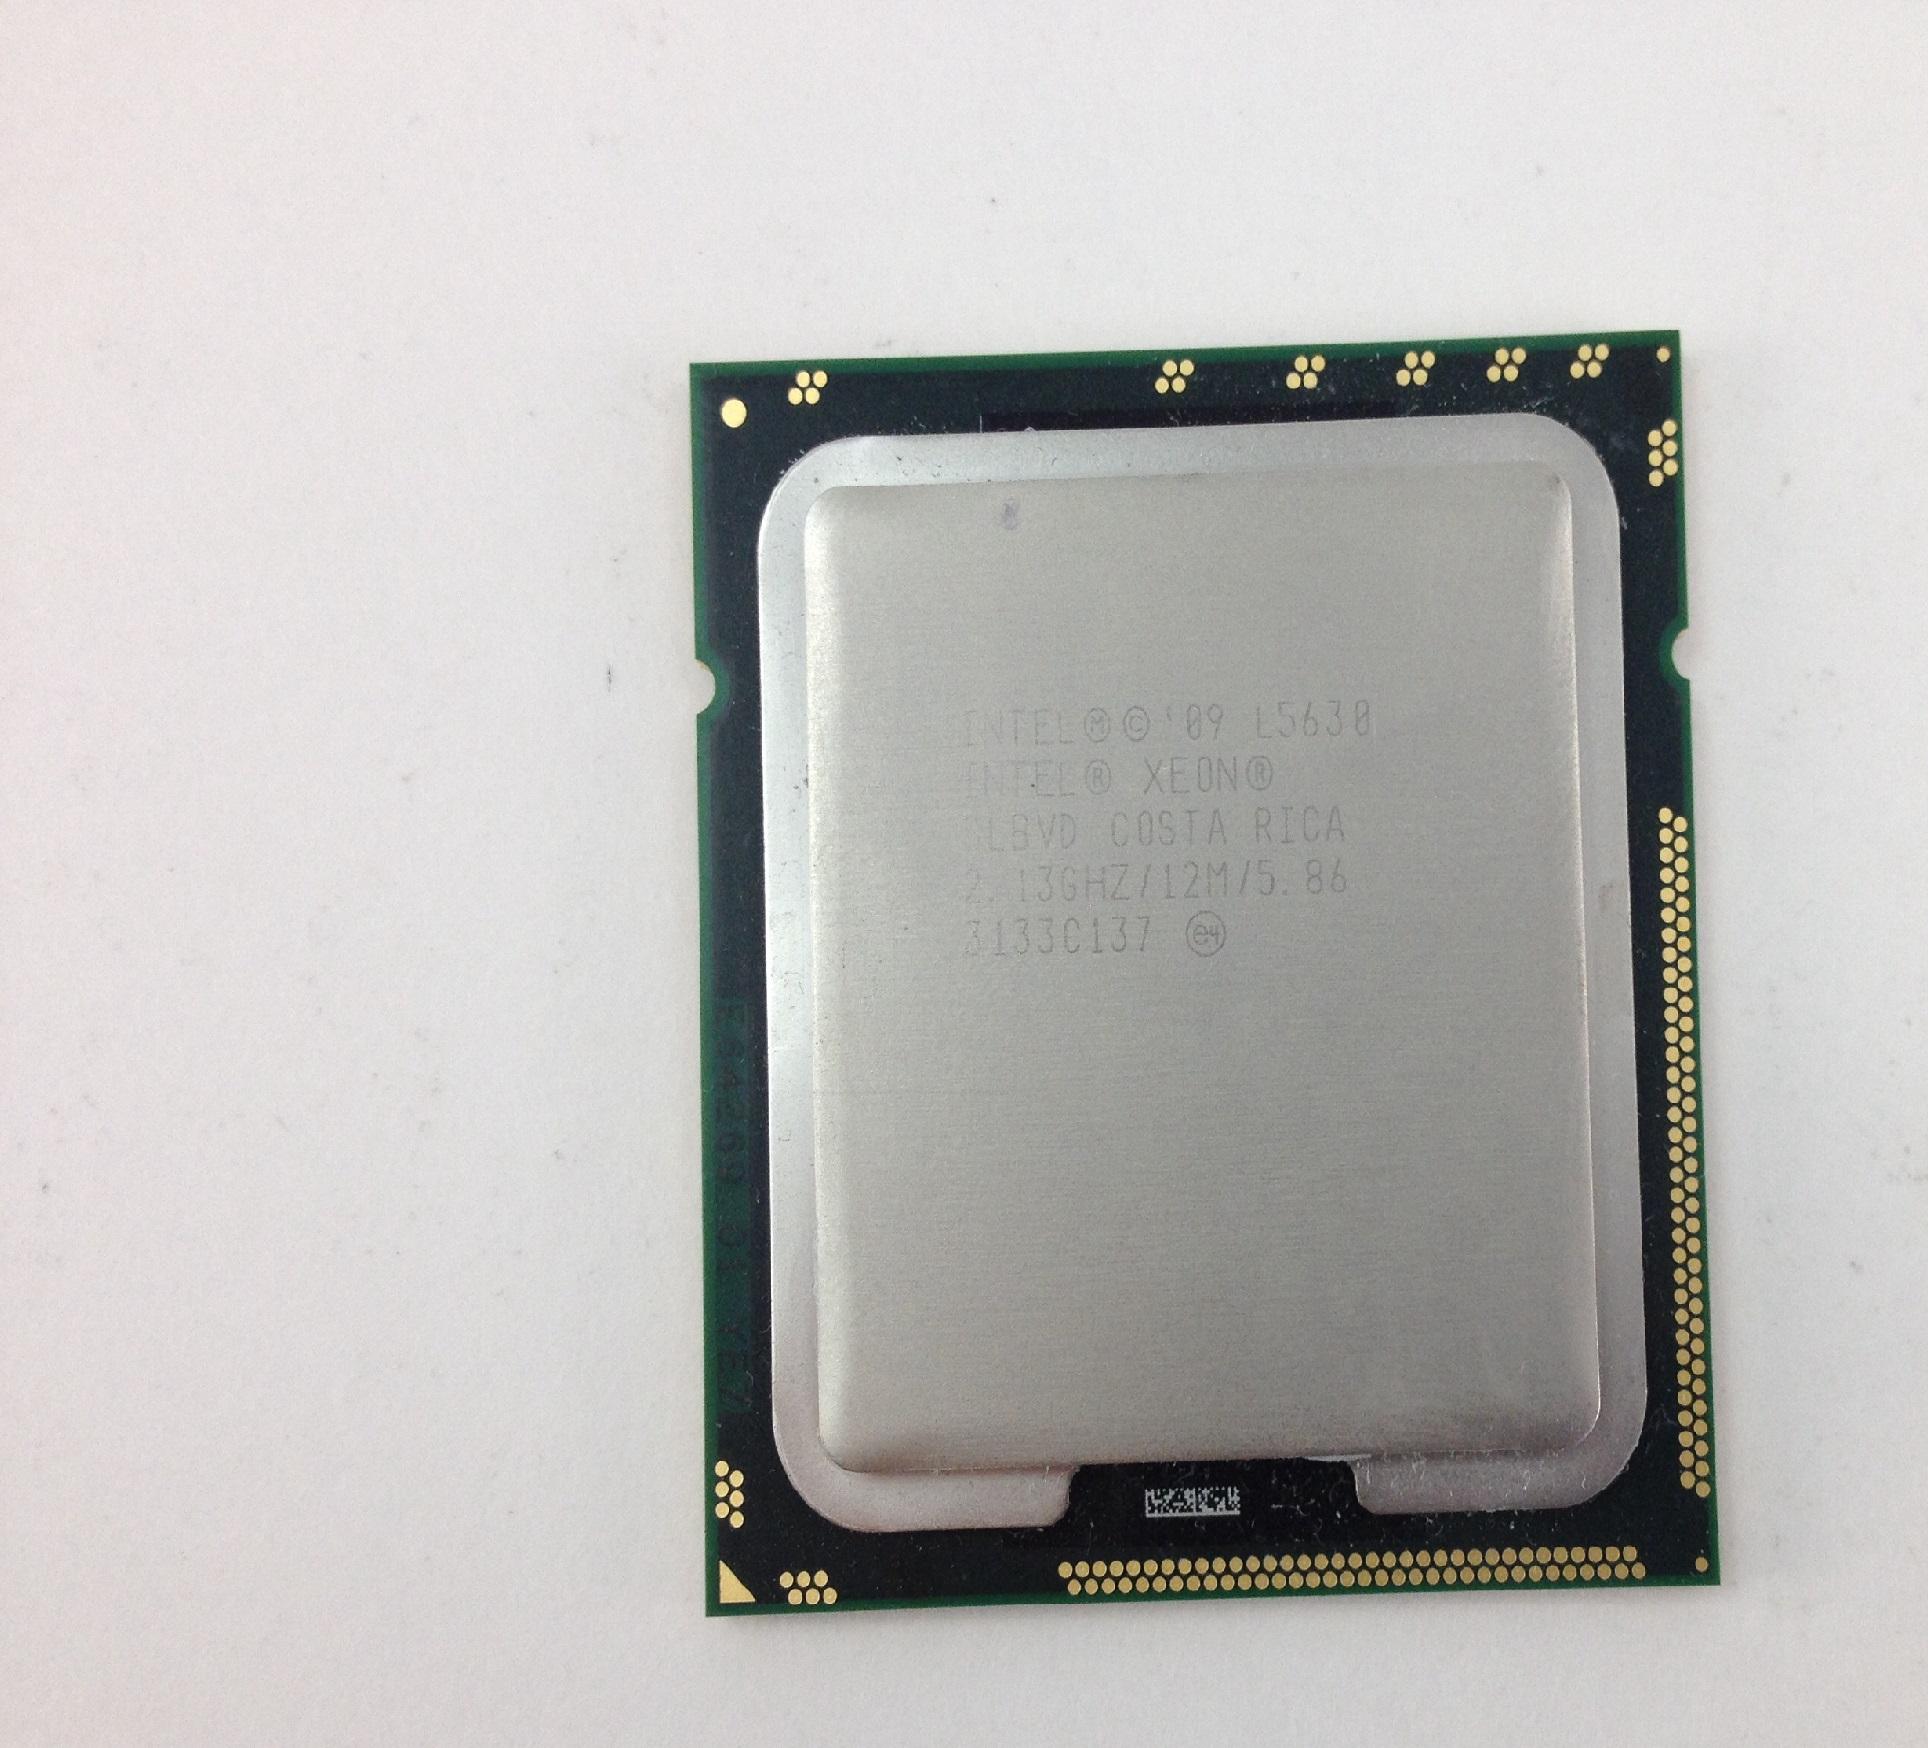 SLBVD INTEL XEON L5630 2.13GHZ QUAD CORE 12MB LGA1366 PROCESSOR (SLBVD)